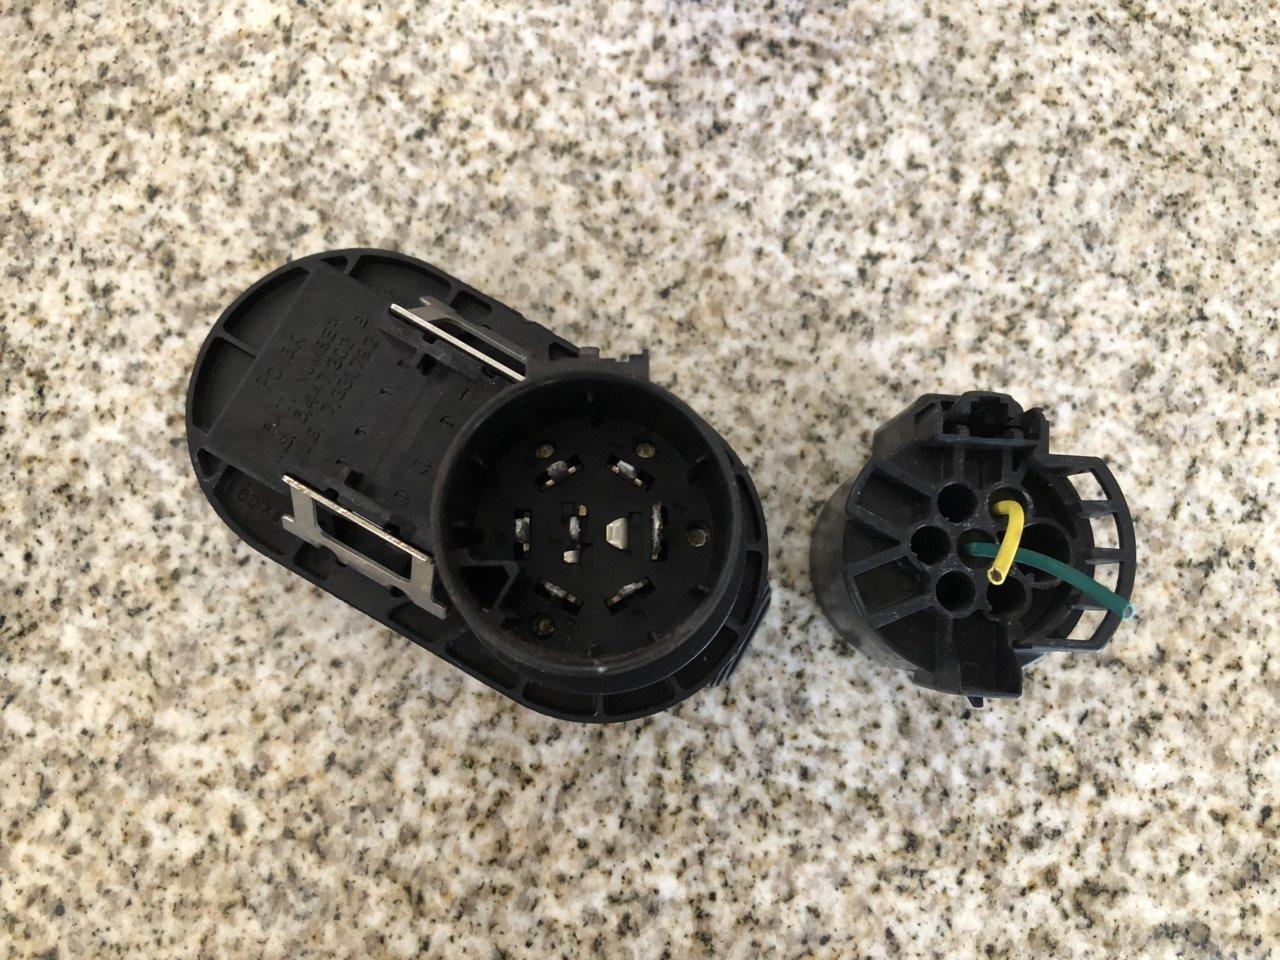 [SCHEMATICS_4FD]  XA_3898] 7 Pin Trailer Plug Wiring Diagram Toyota Tundra 2007 Download  Diagram | 7 Pin Trailer Plug Wiring Diagram Toyota Tundra 2007 |  | Vish Peted Kapemie Semec Erbug Seme Nizat Chim Numap Jebrp Mohammedshrine  Librar Wiring 101